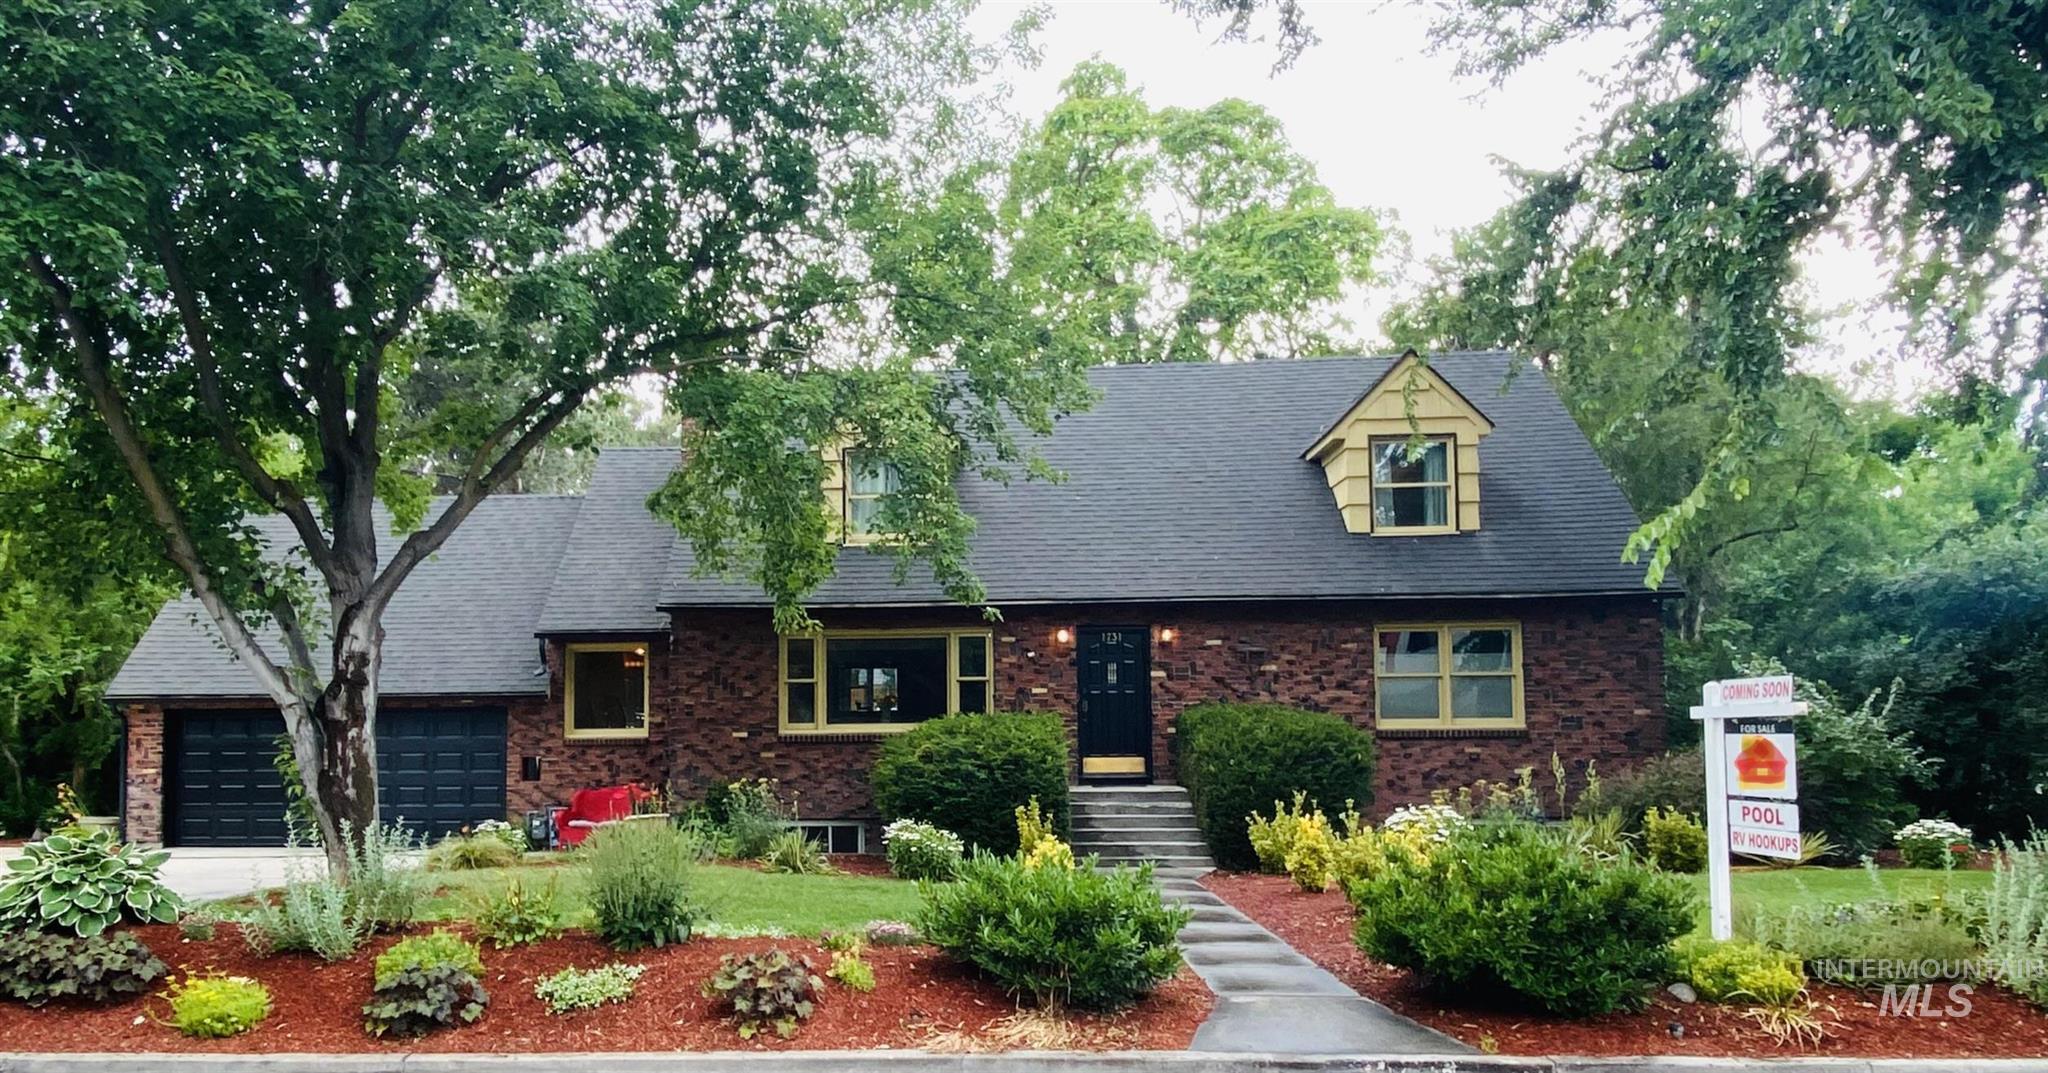 1731 S Michigan Ave Property Photo